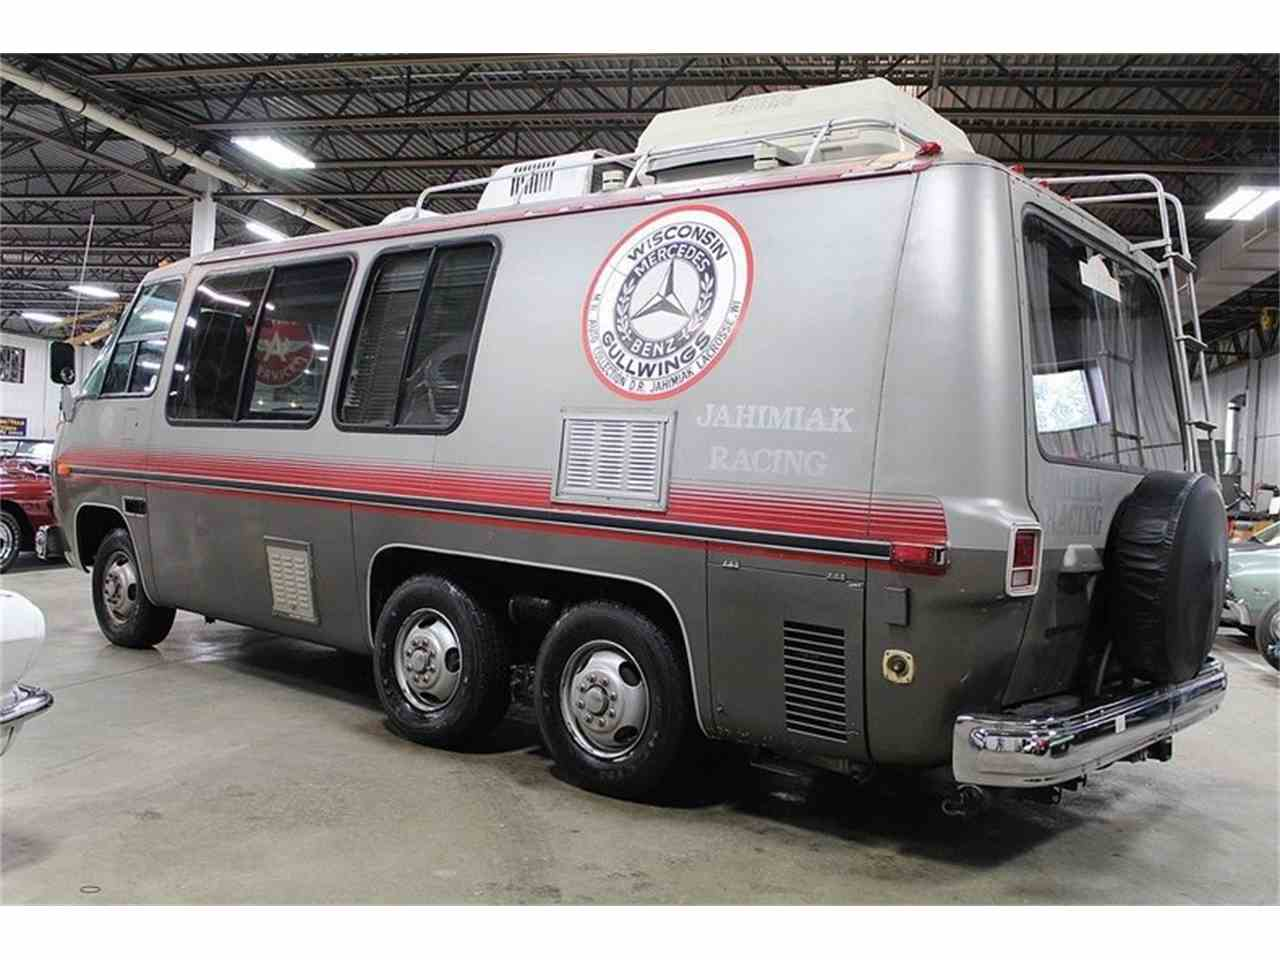 1977 GMC Front Wheel Drive Motorhome for Sale  ClassicCarscom